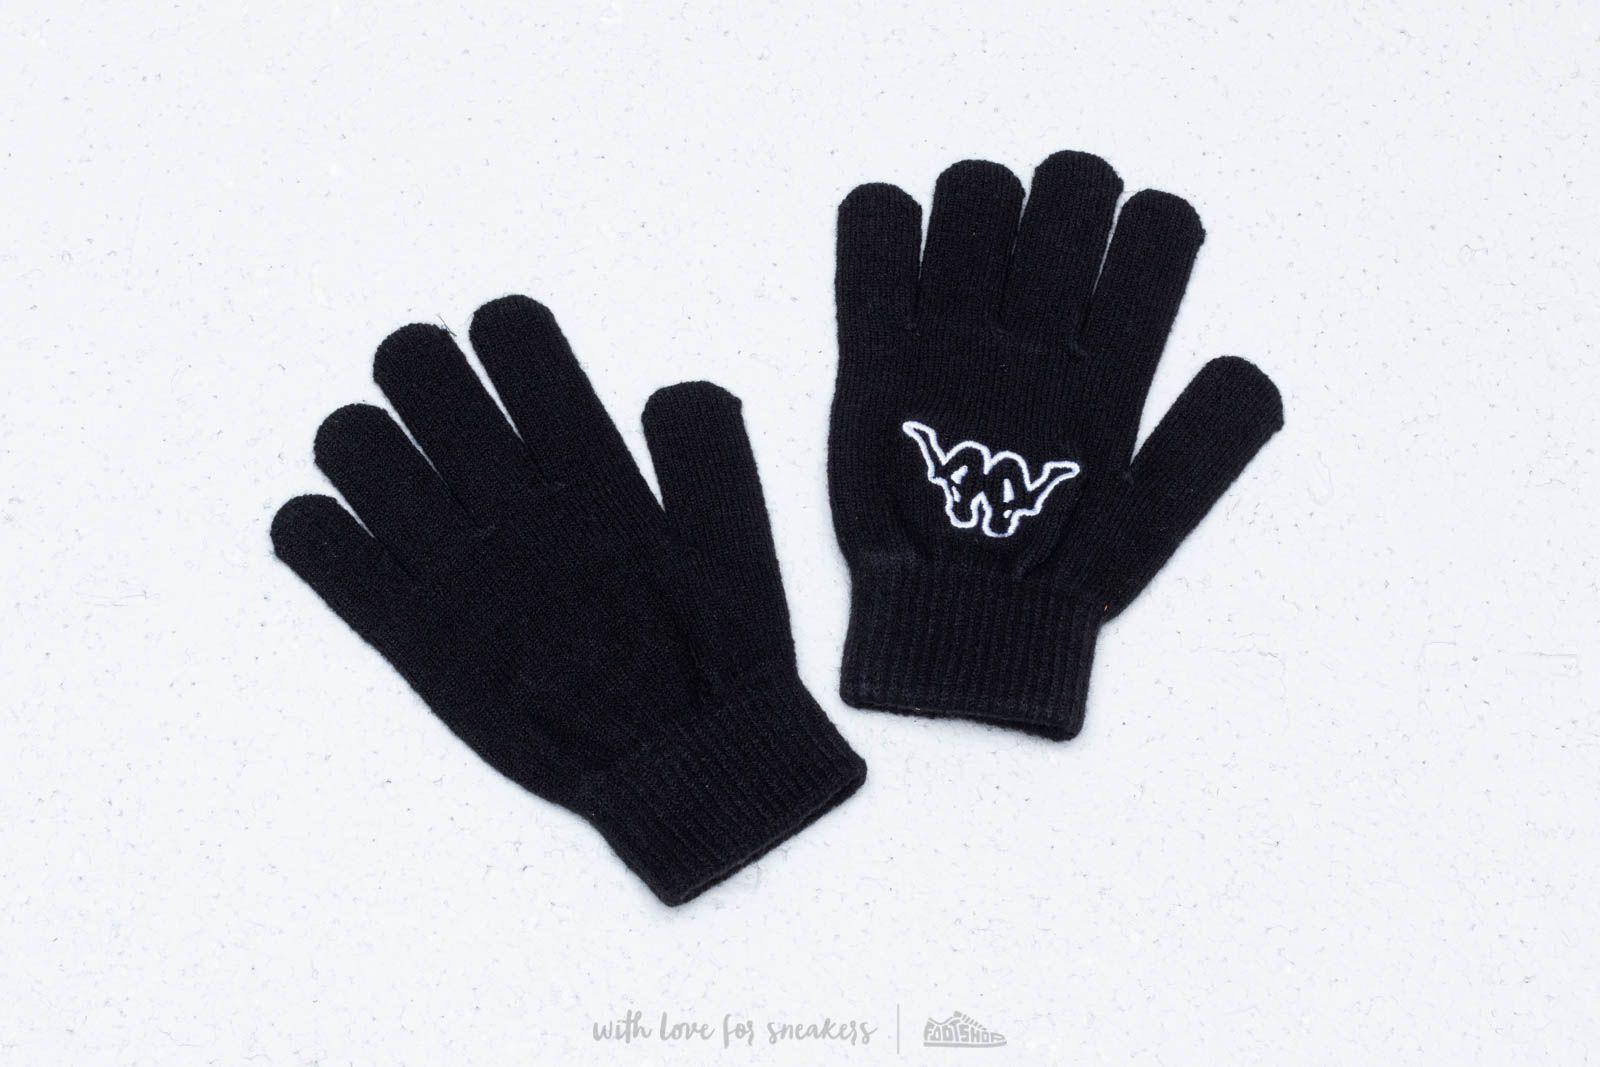 Kappa Logo Foplane Gloves